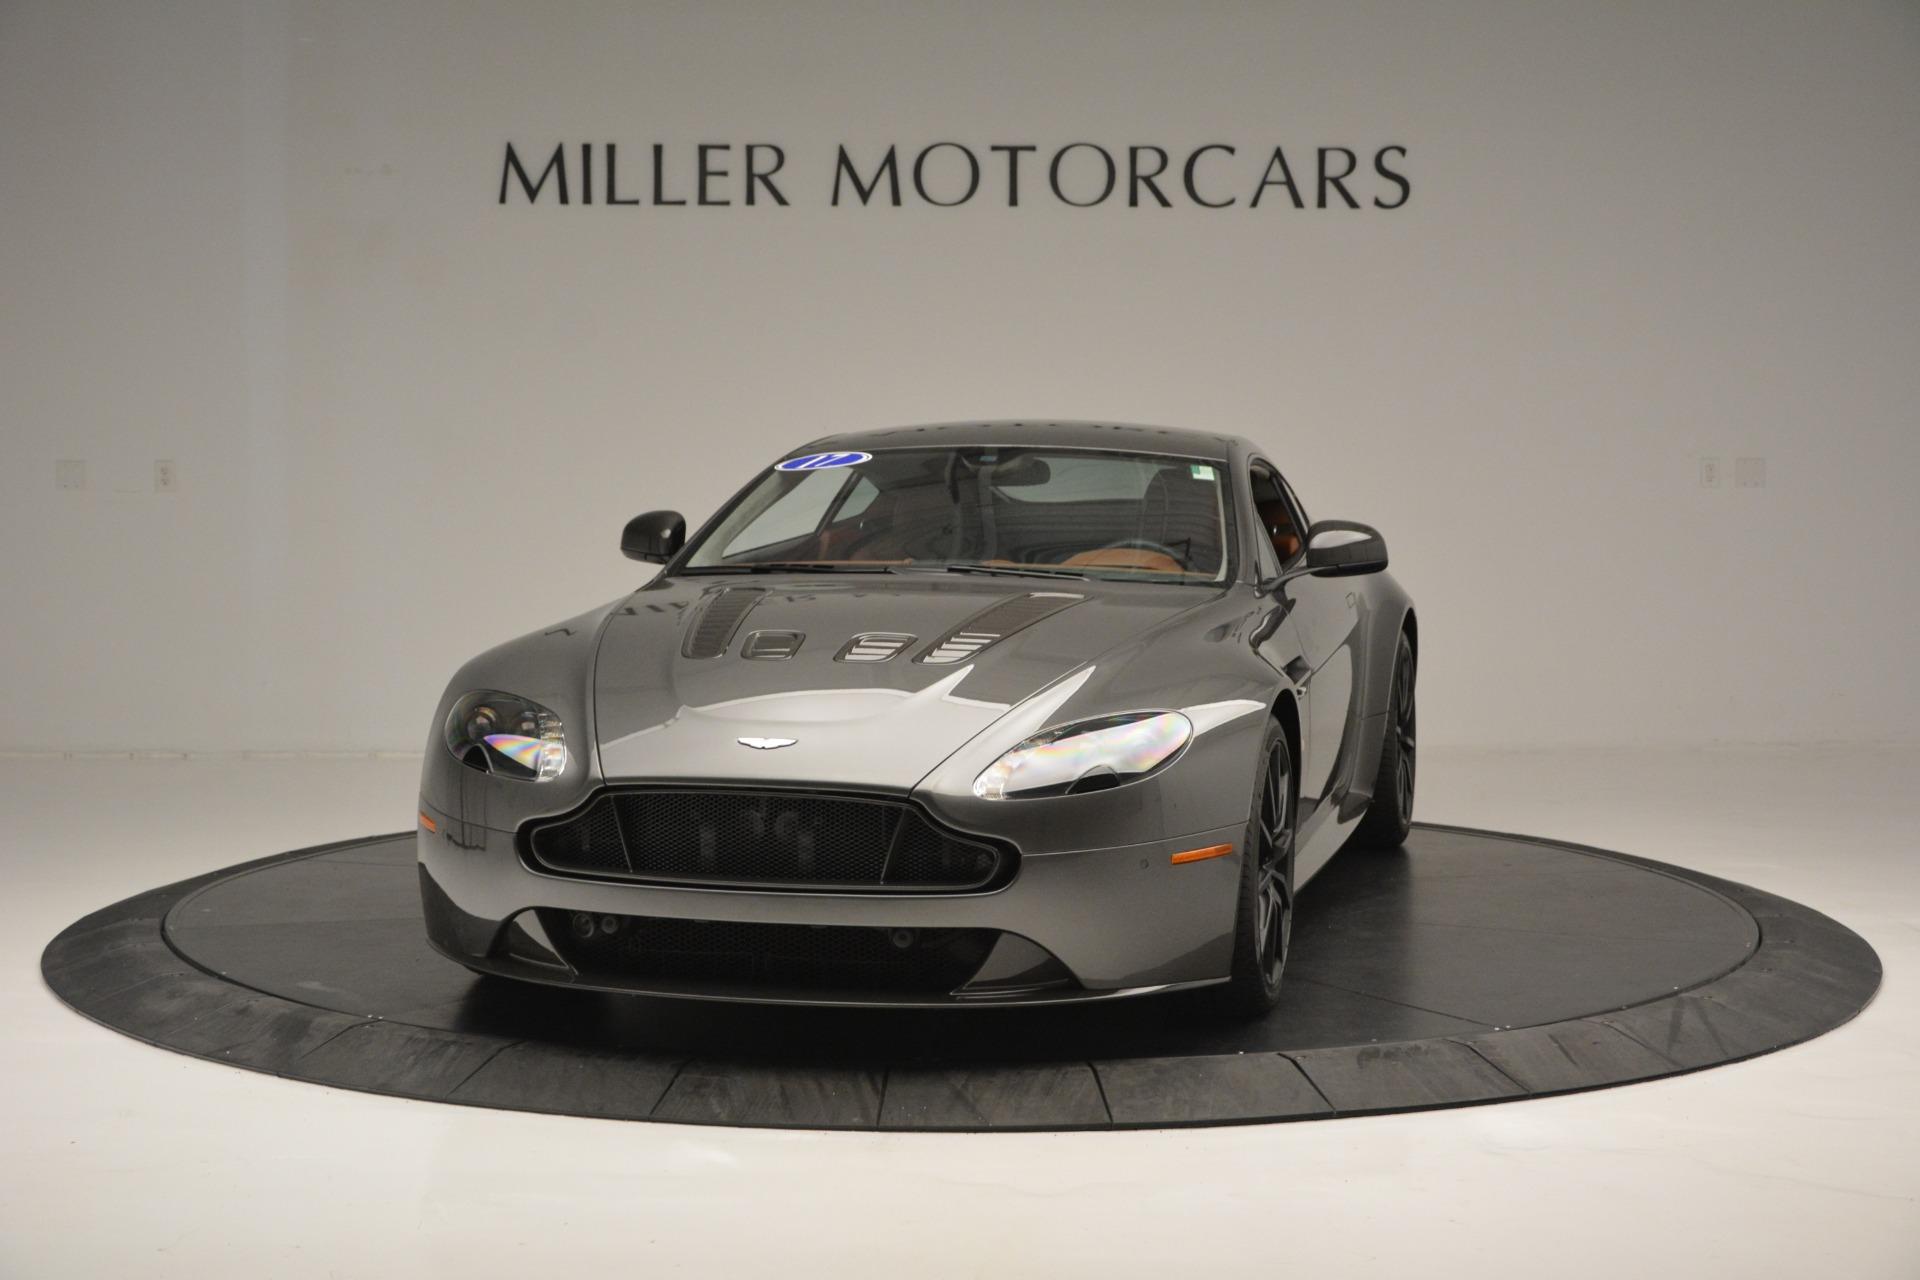 Used 2017 Aston Martin V12 Vantage S  For Sale In Greenwich, CT. Alfa Romeo of Greenwich, 7429 2561_main